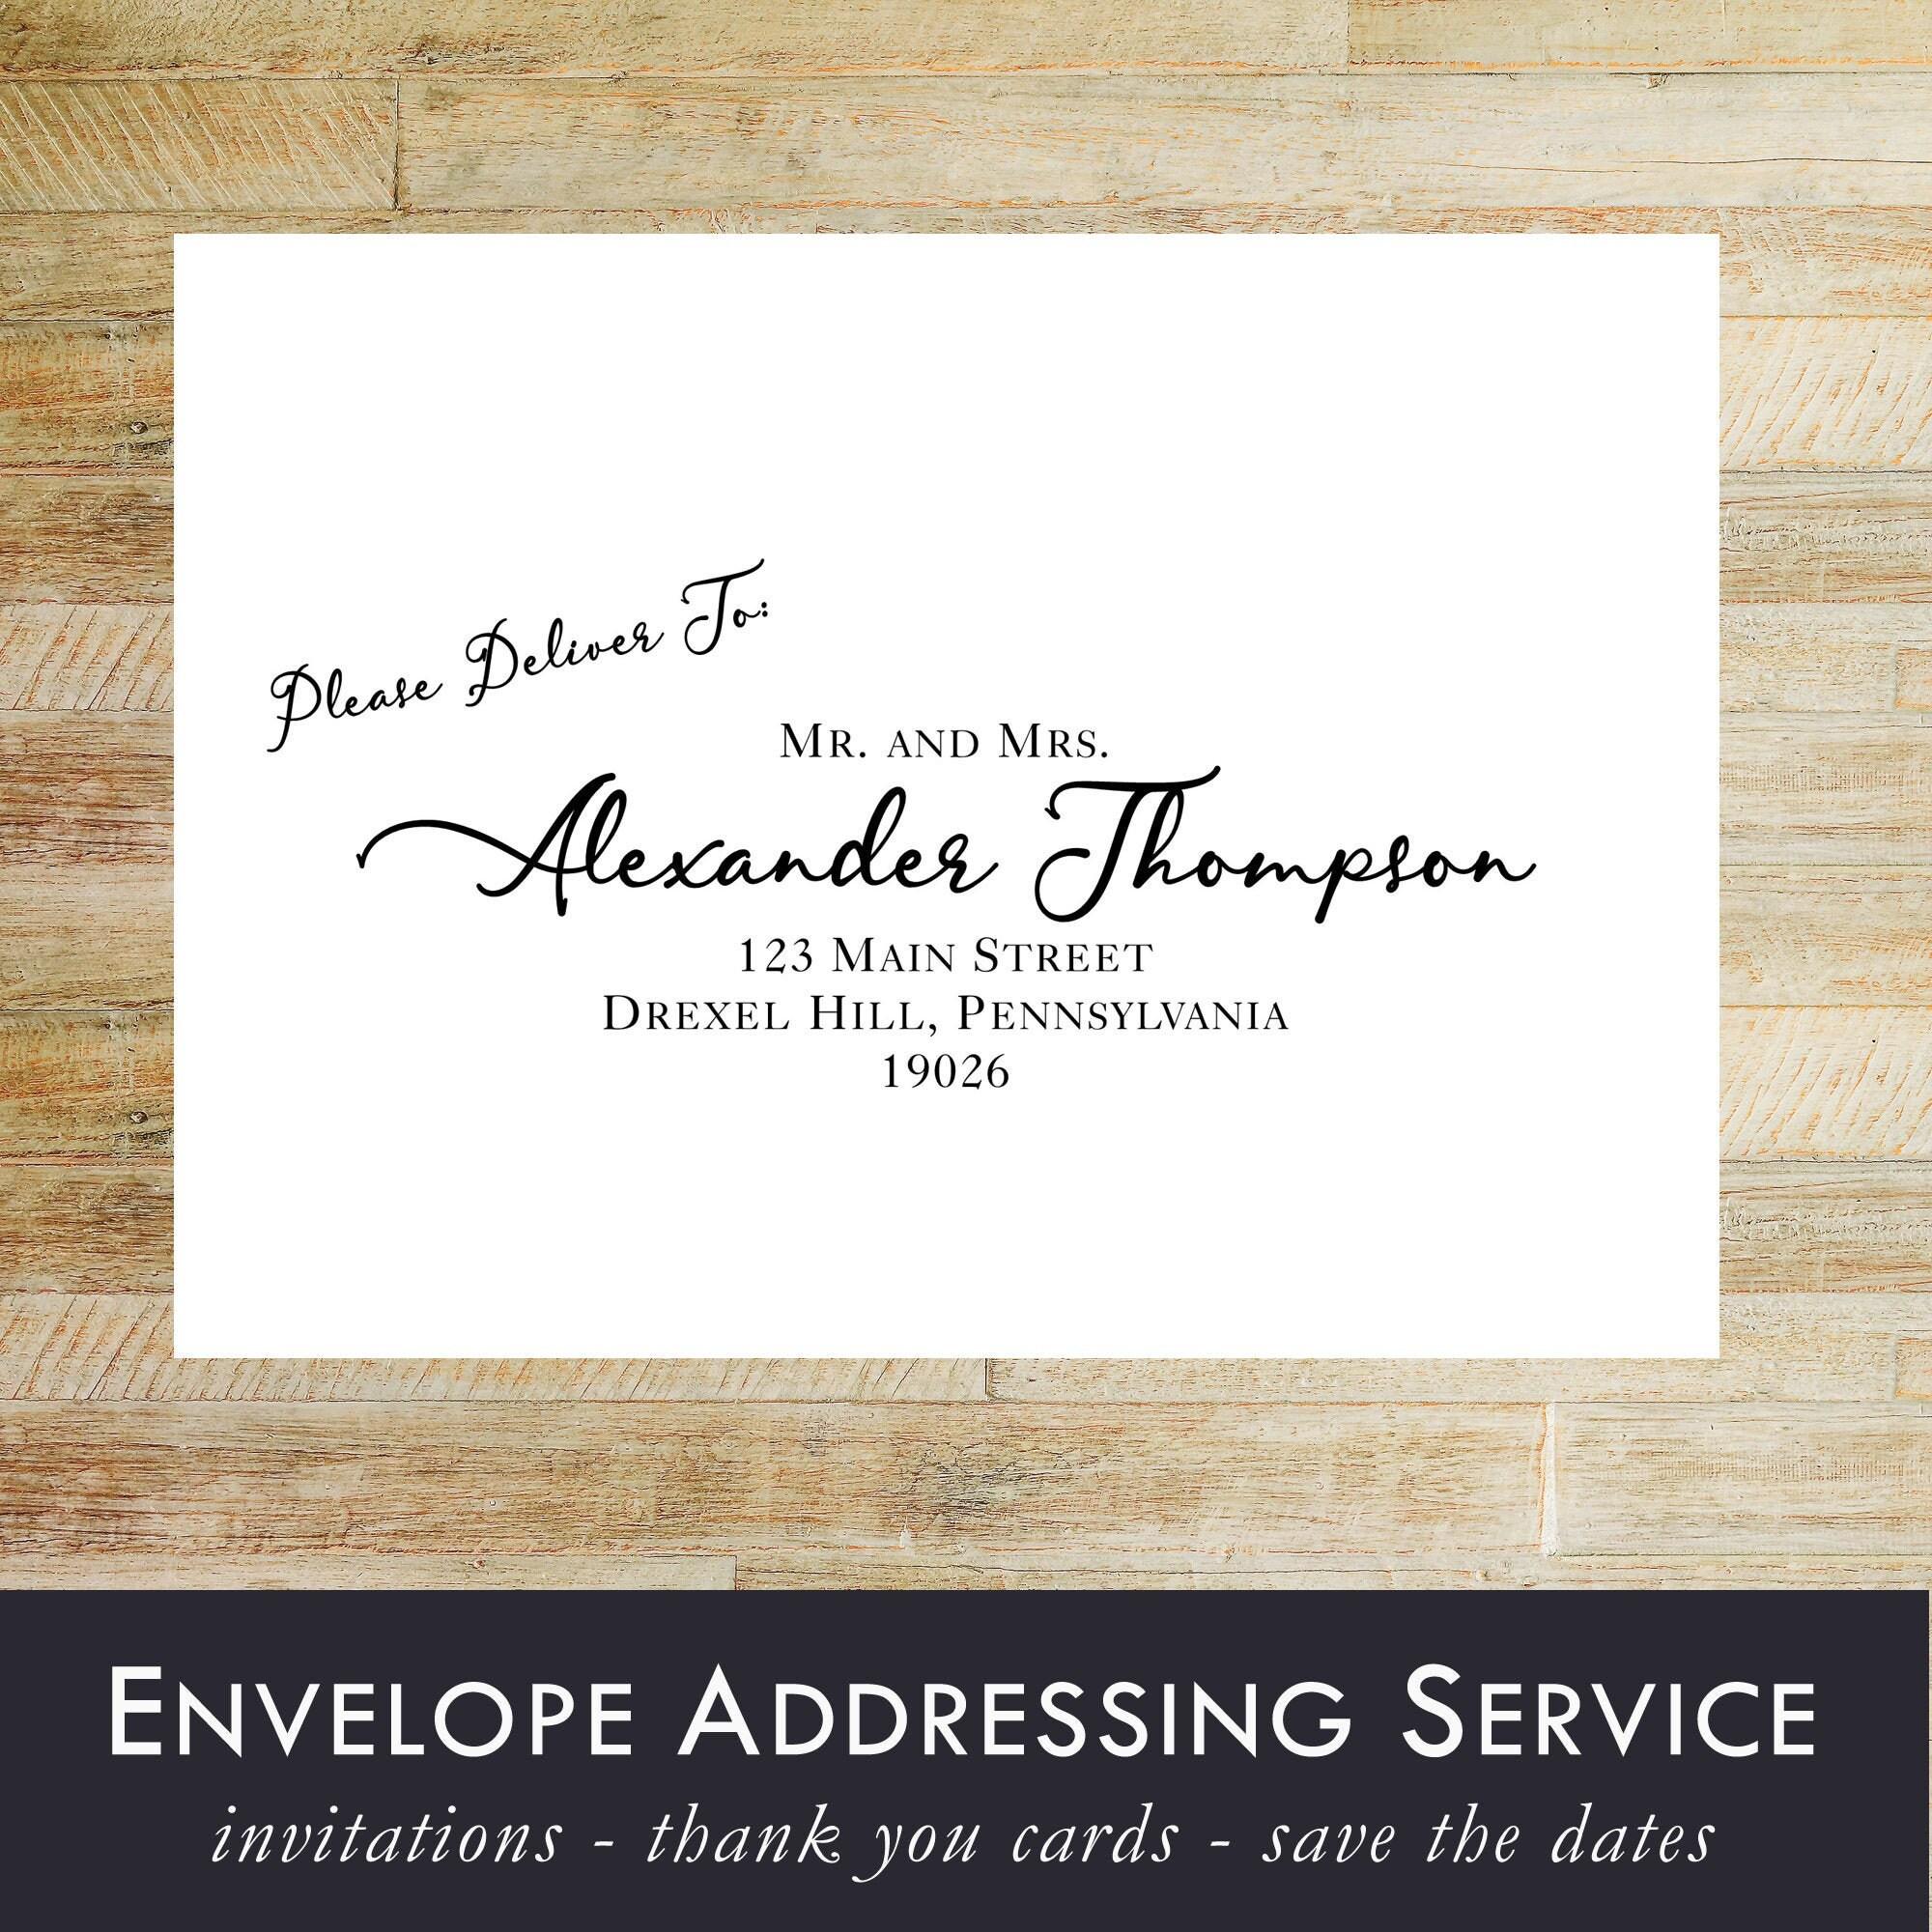 Envelope Addressing Service Wedding Invitations Thank You Card